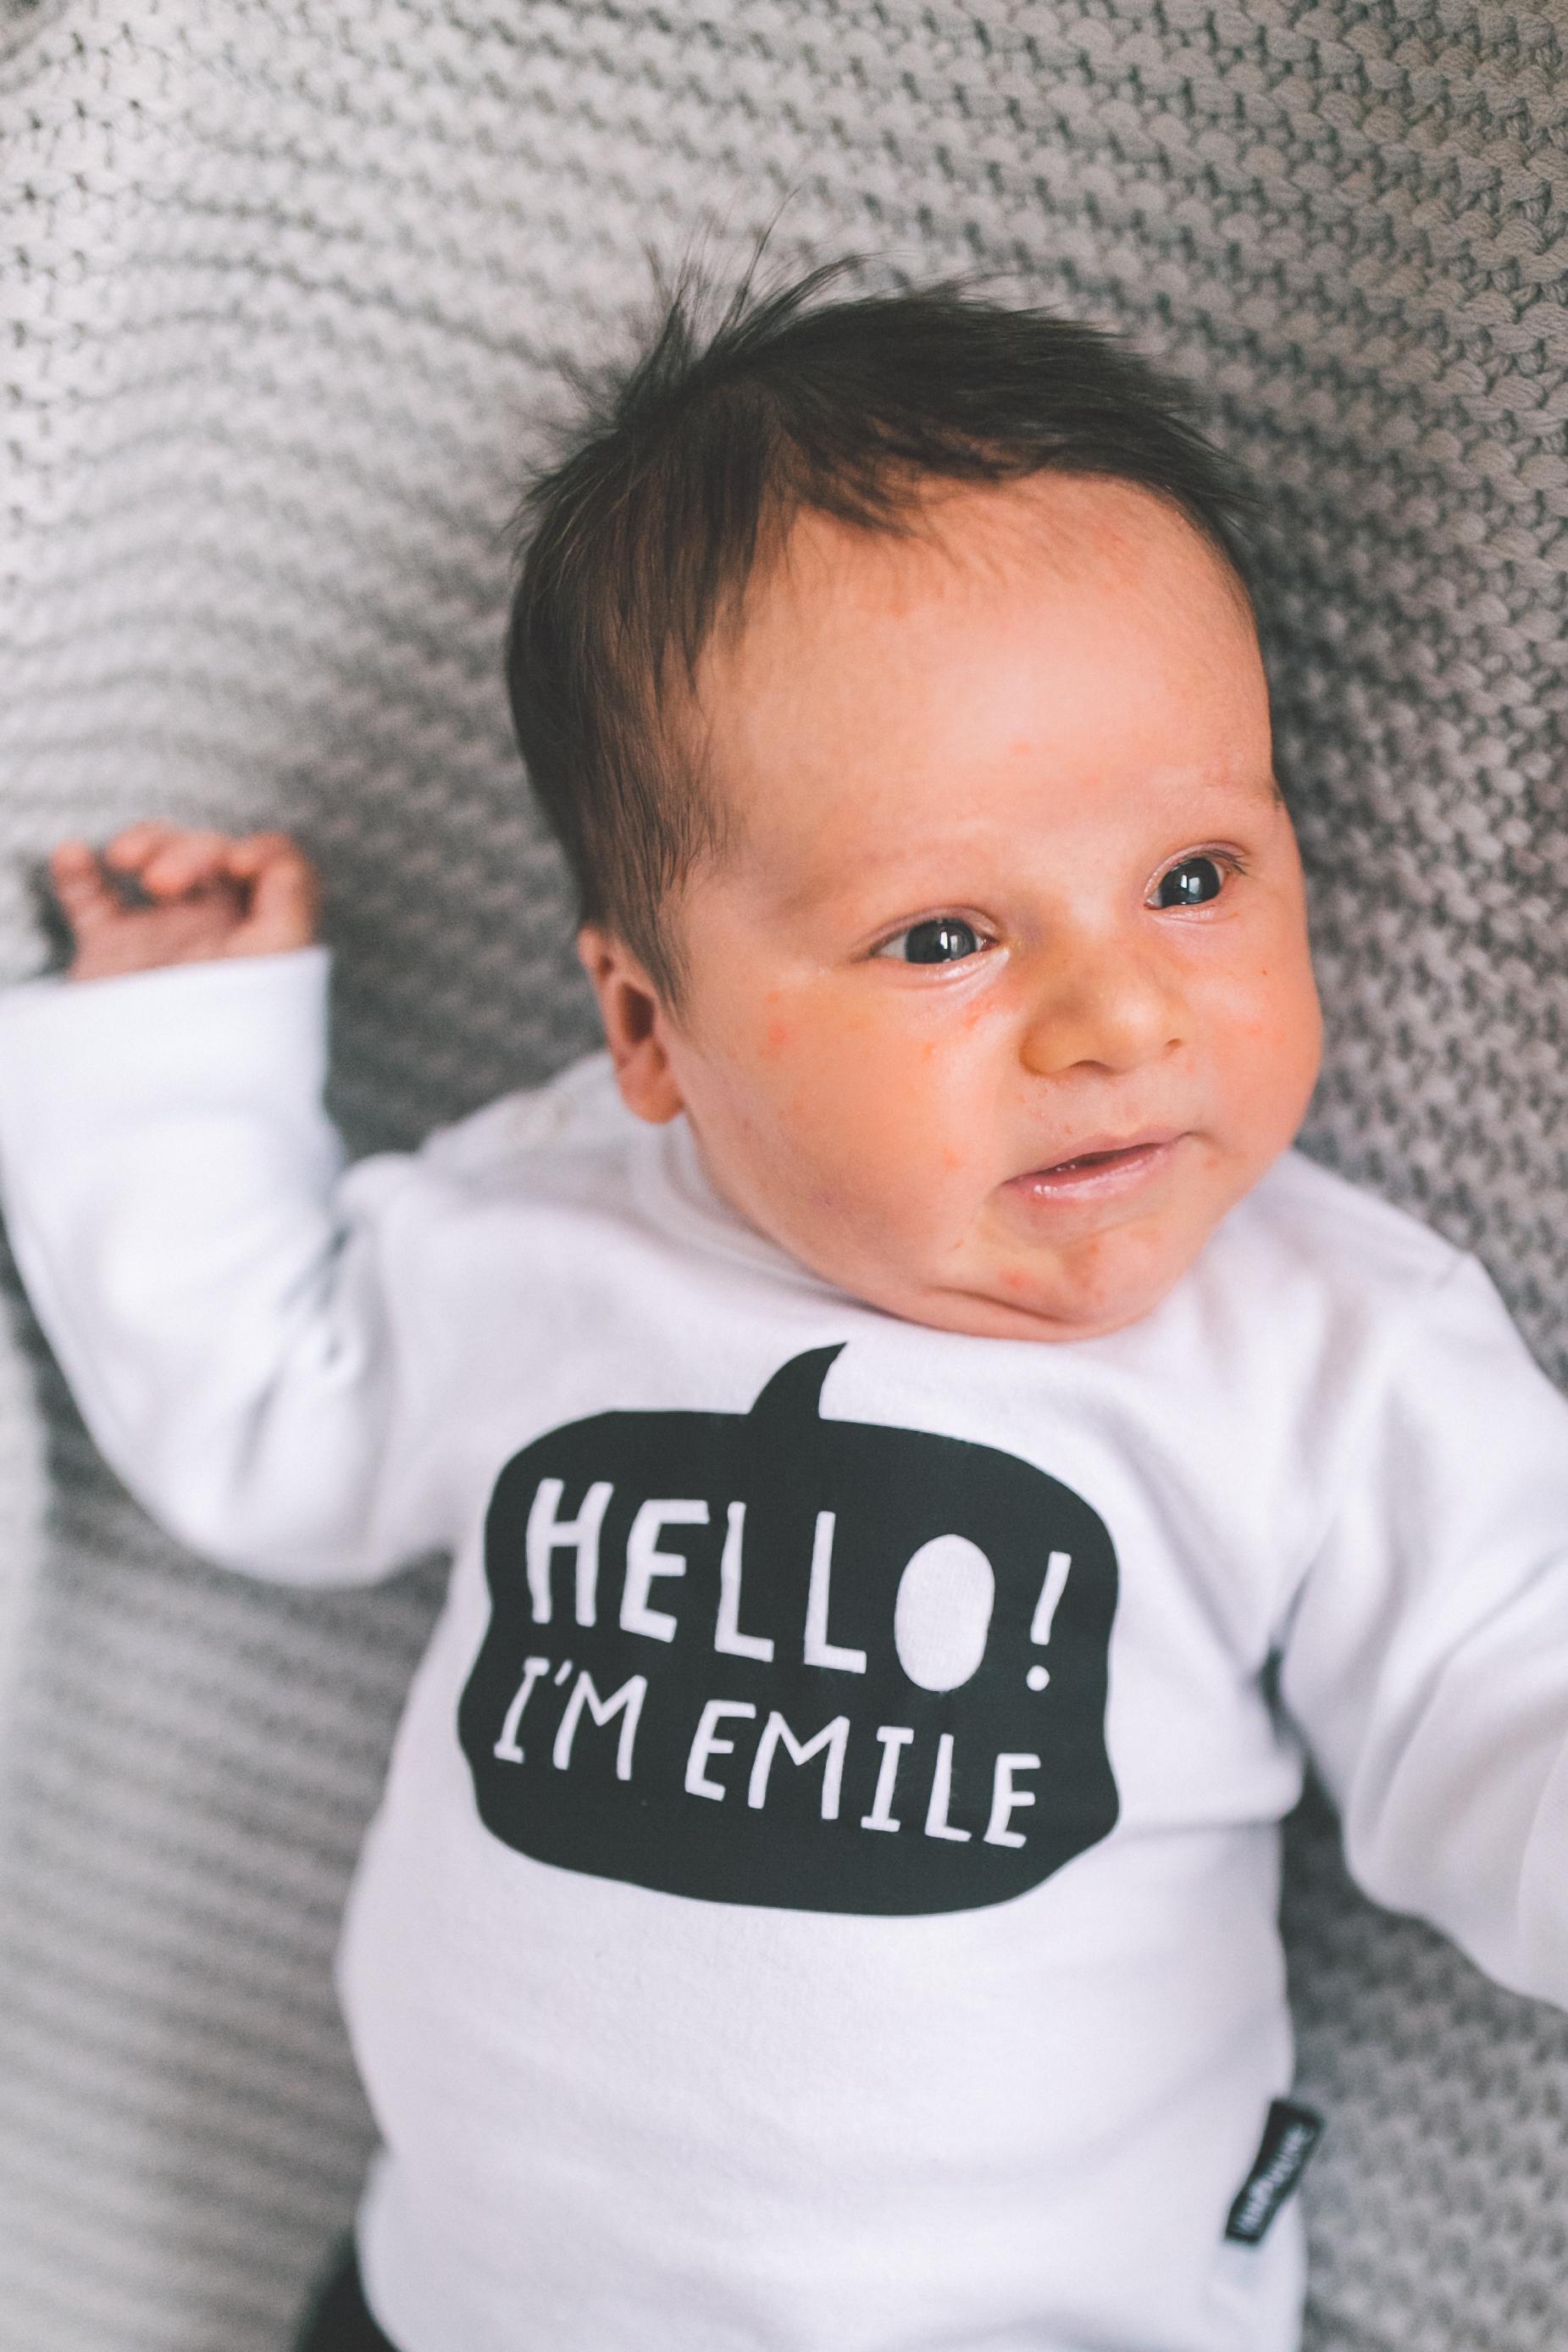 EMILE-9089